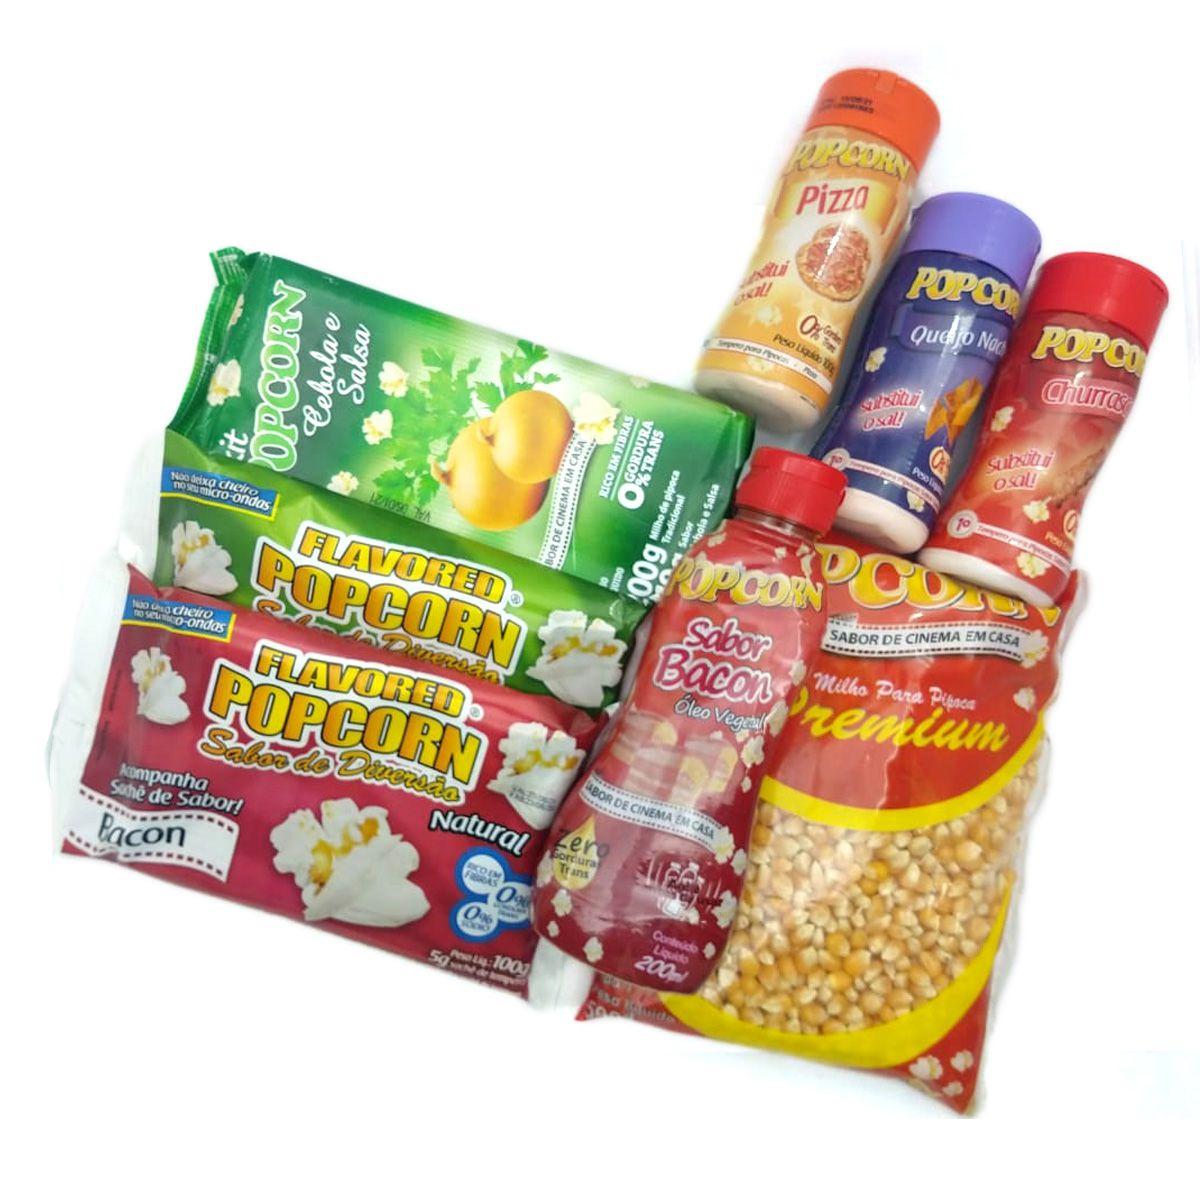 Kit Popcorn de cinema em casa nº5.